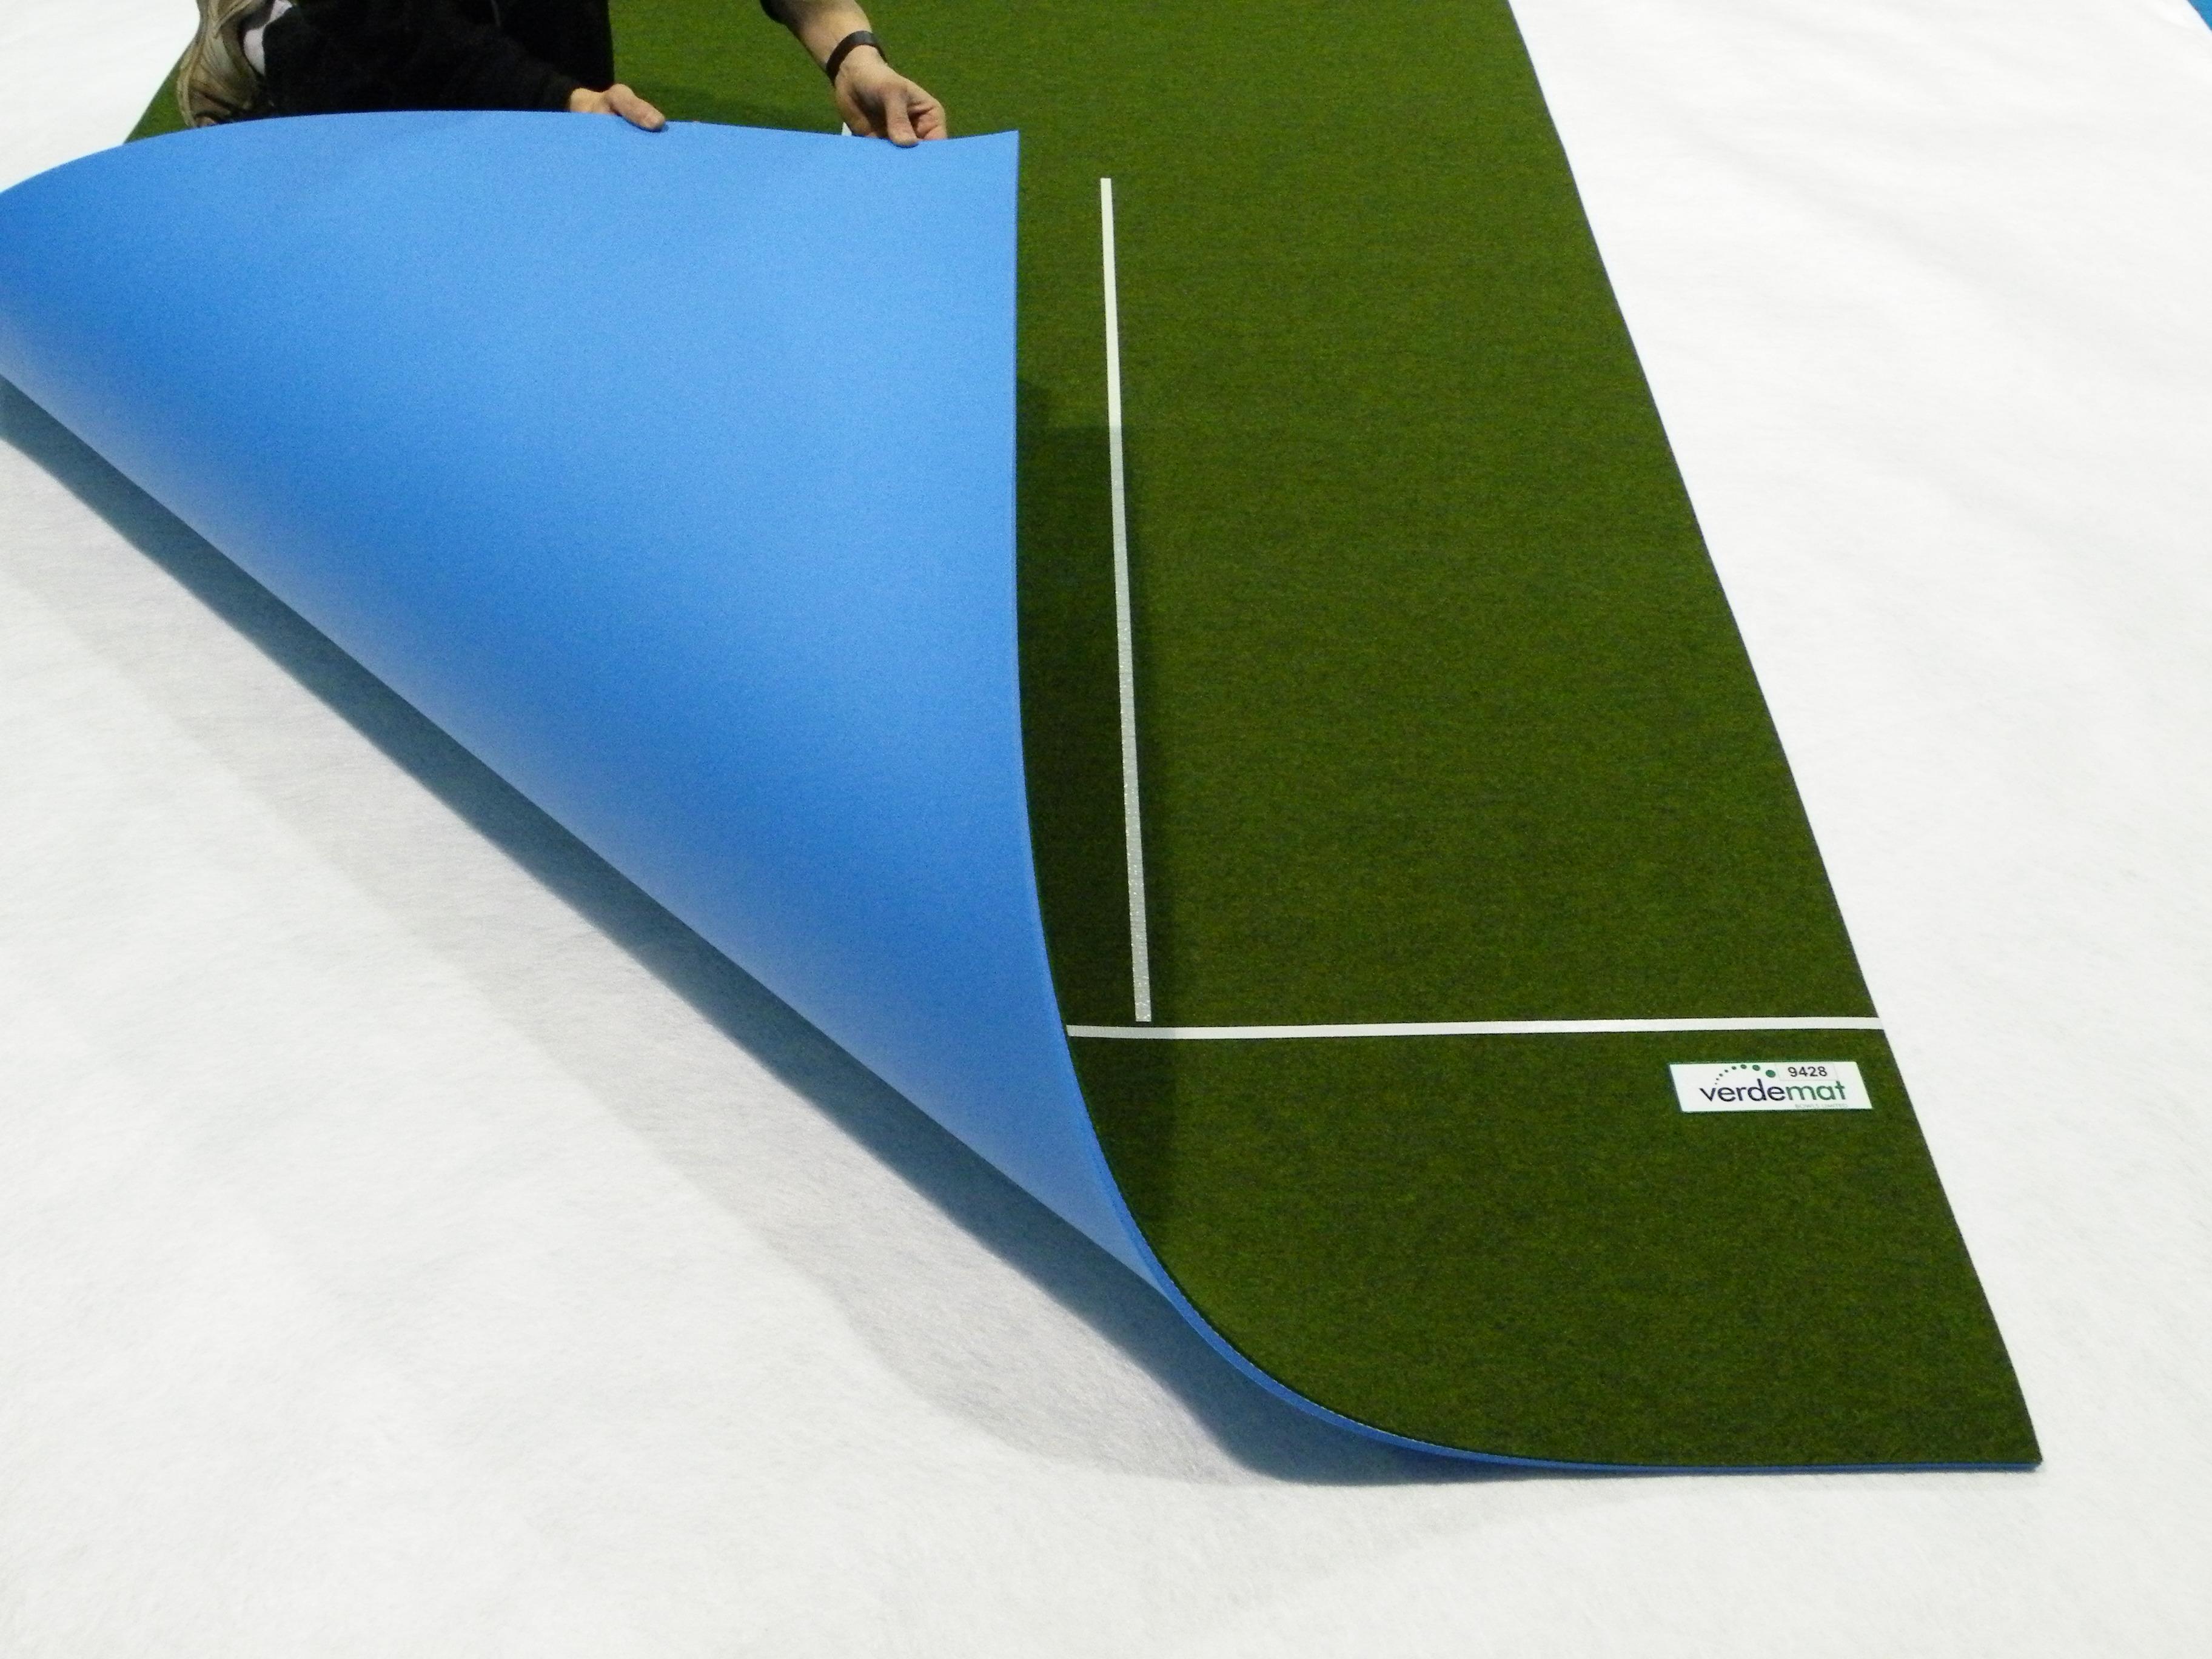 Carpet - 30' Carpet Bowling